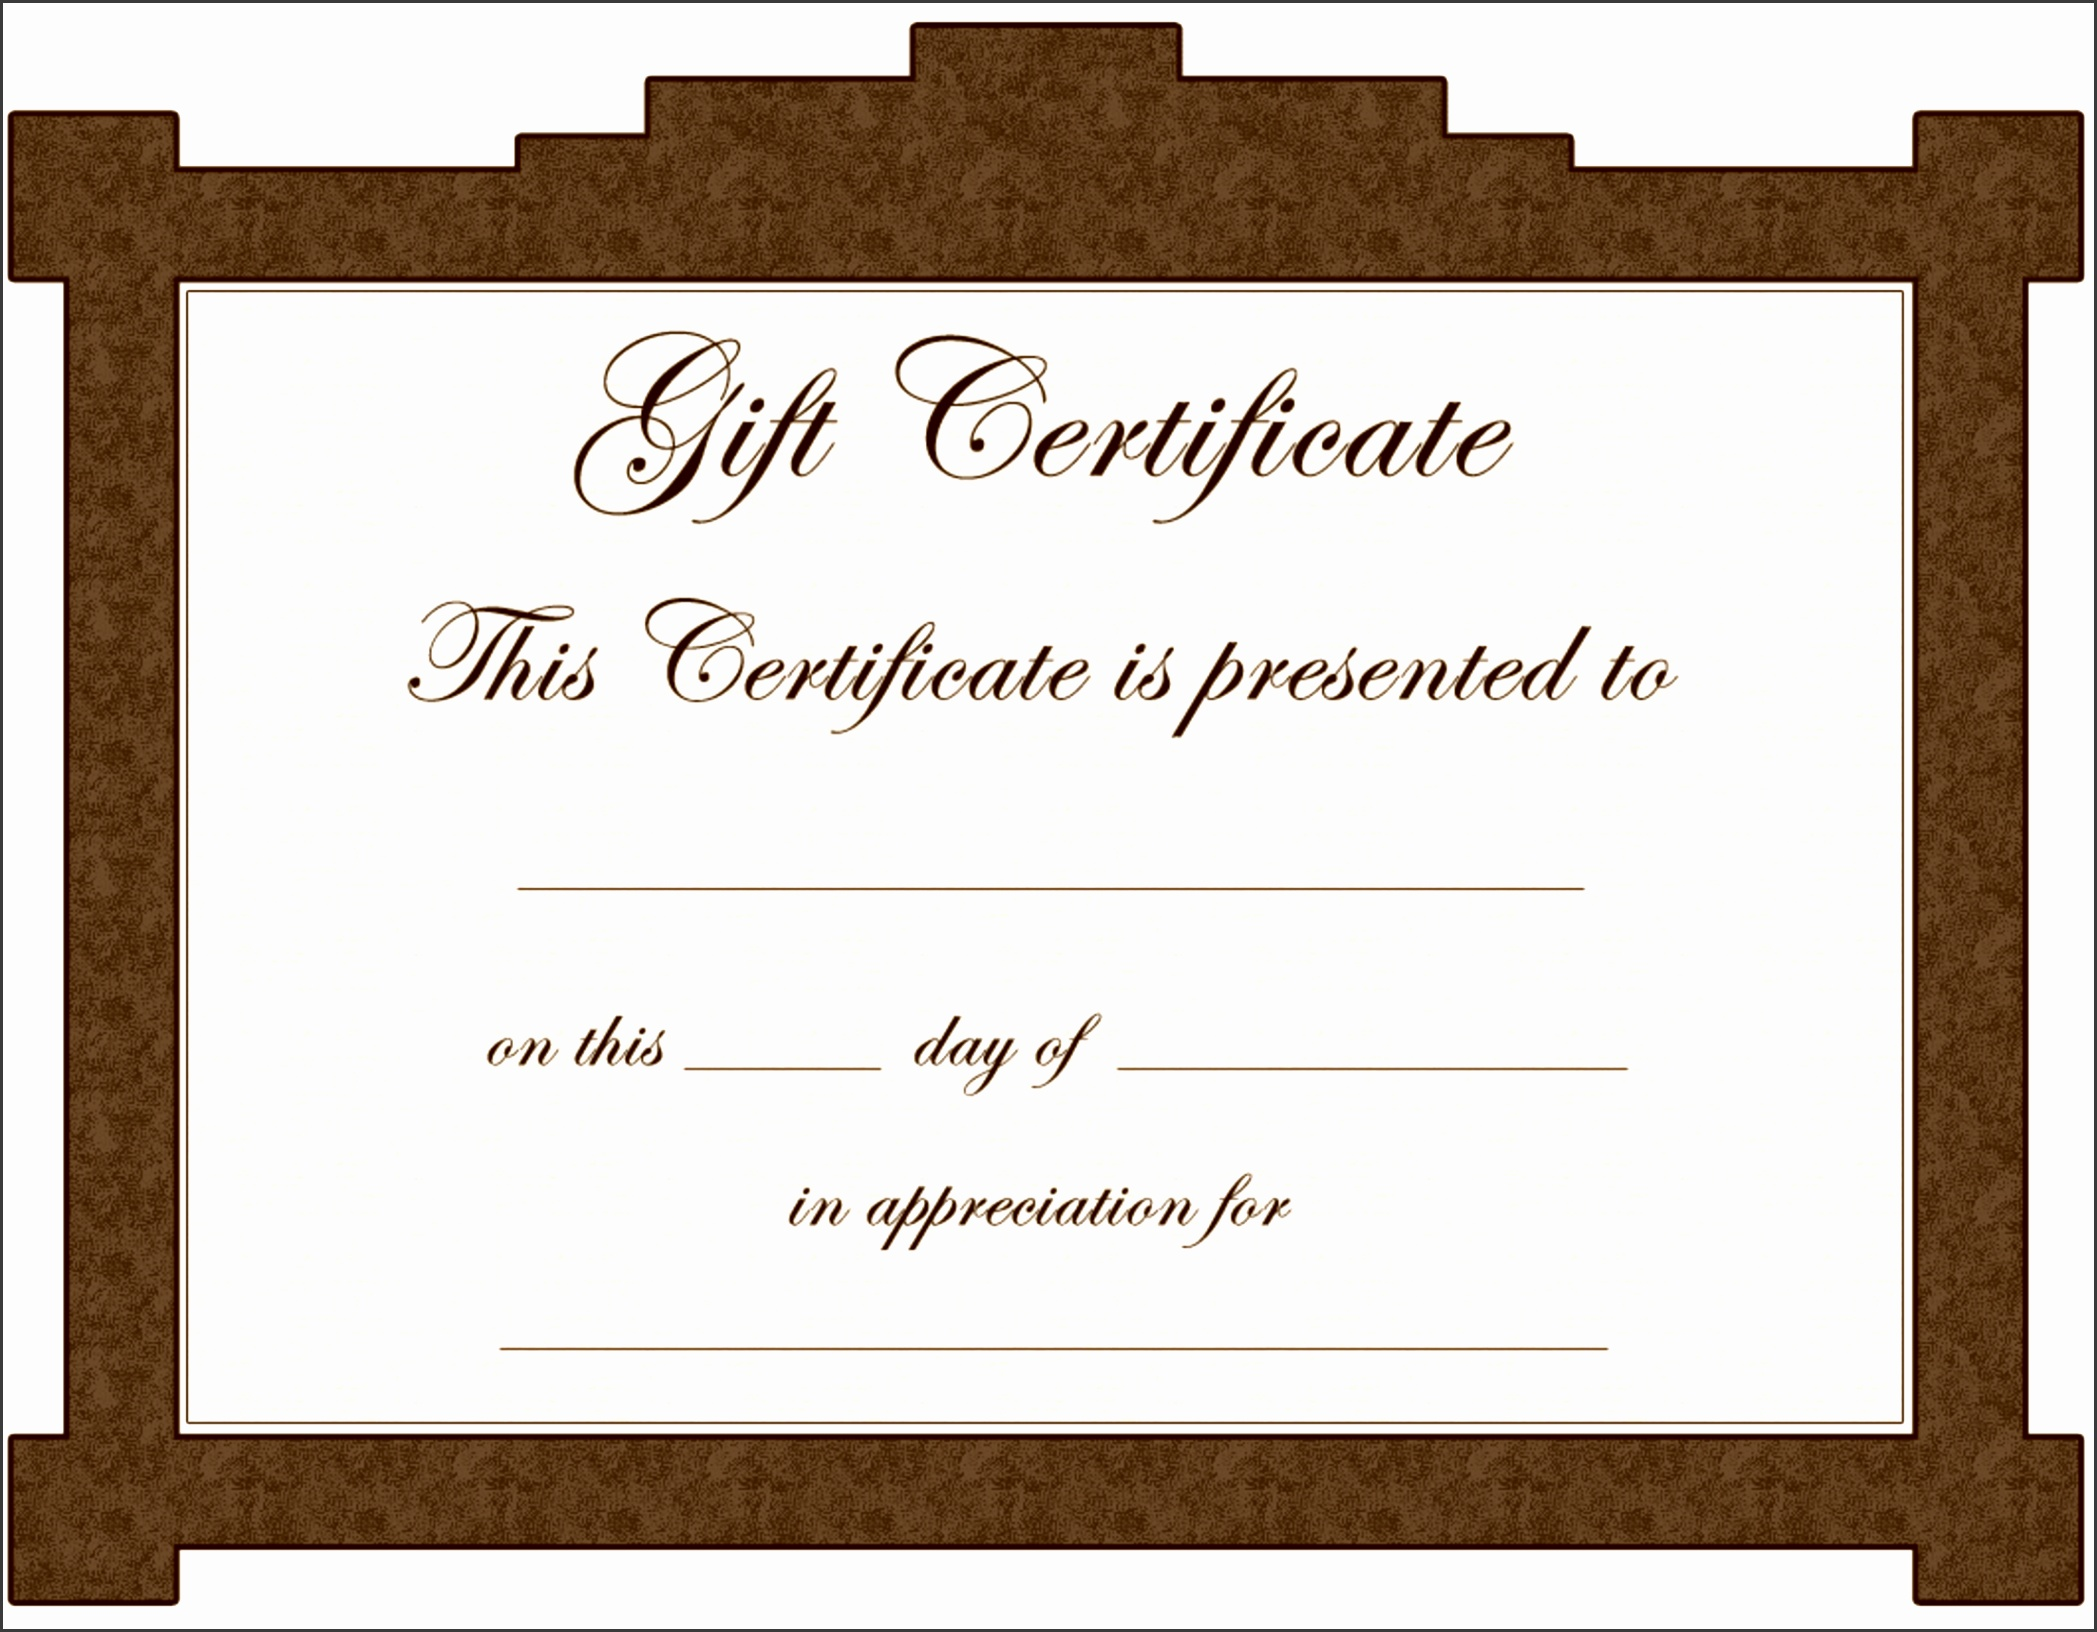 Avon Gift Certificate Template